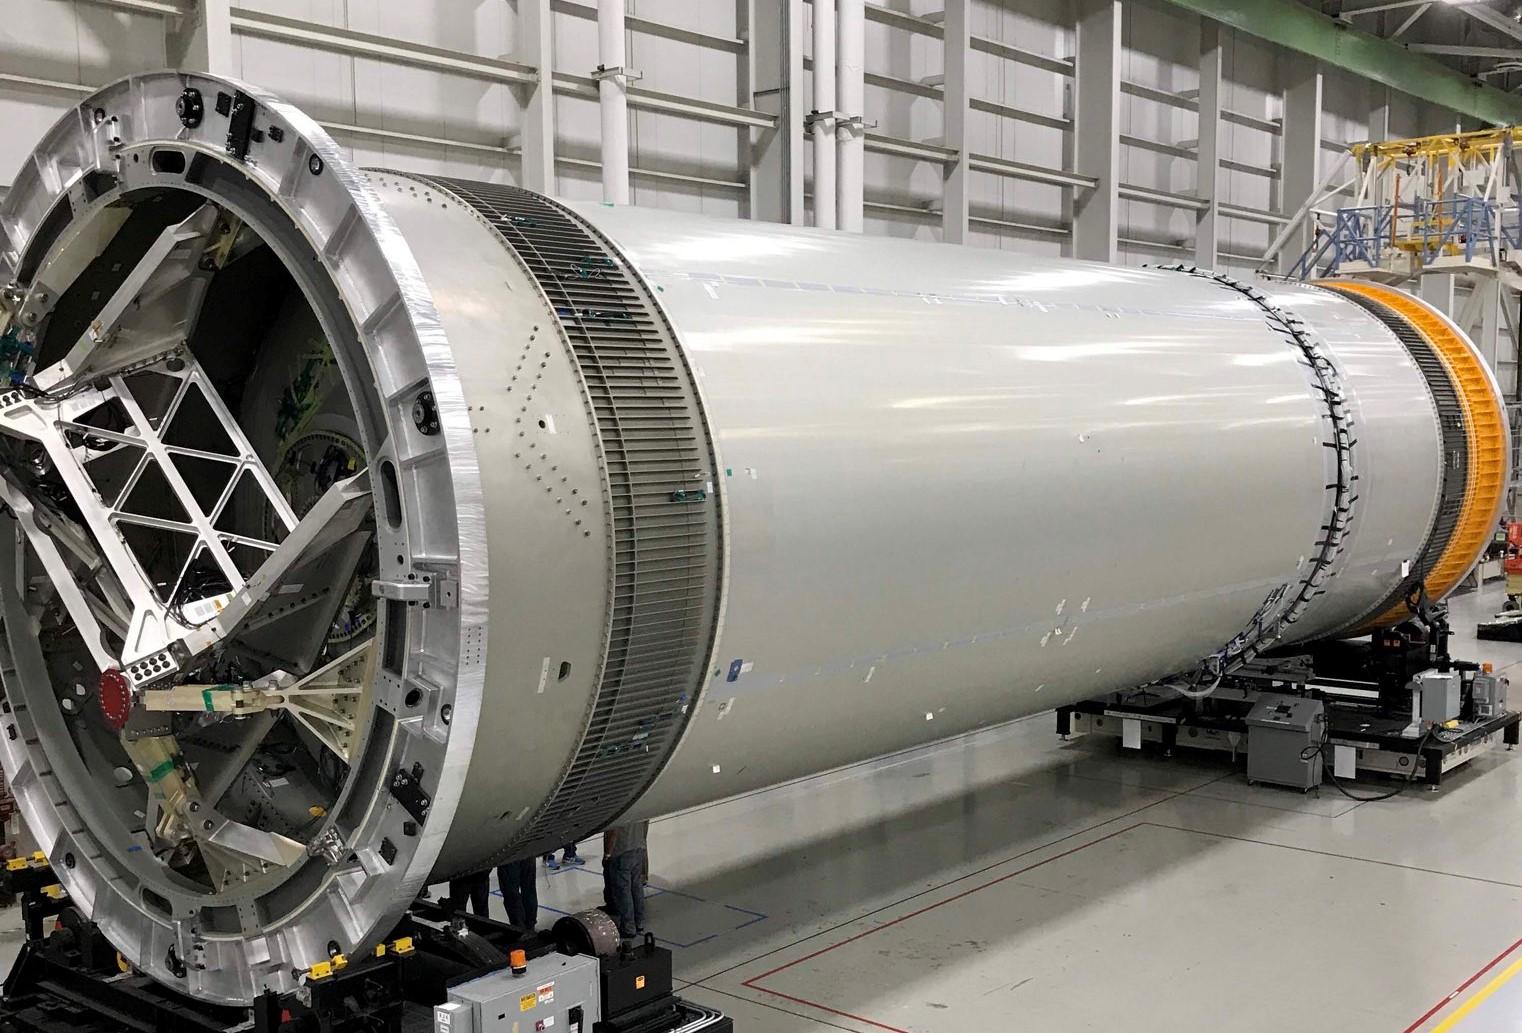 Vulcan structural qual booster 073119 (Tory Bruno) 1 crop